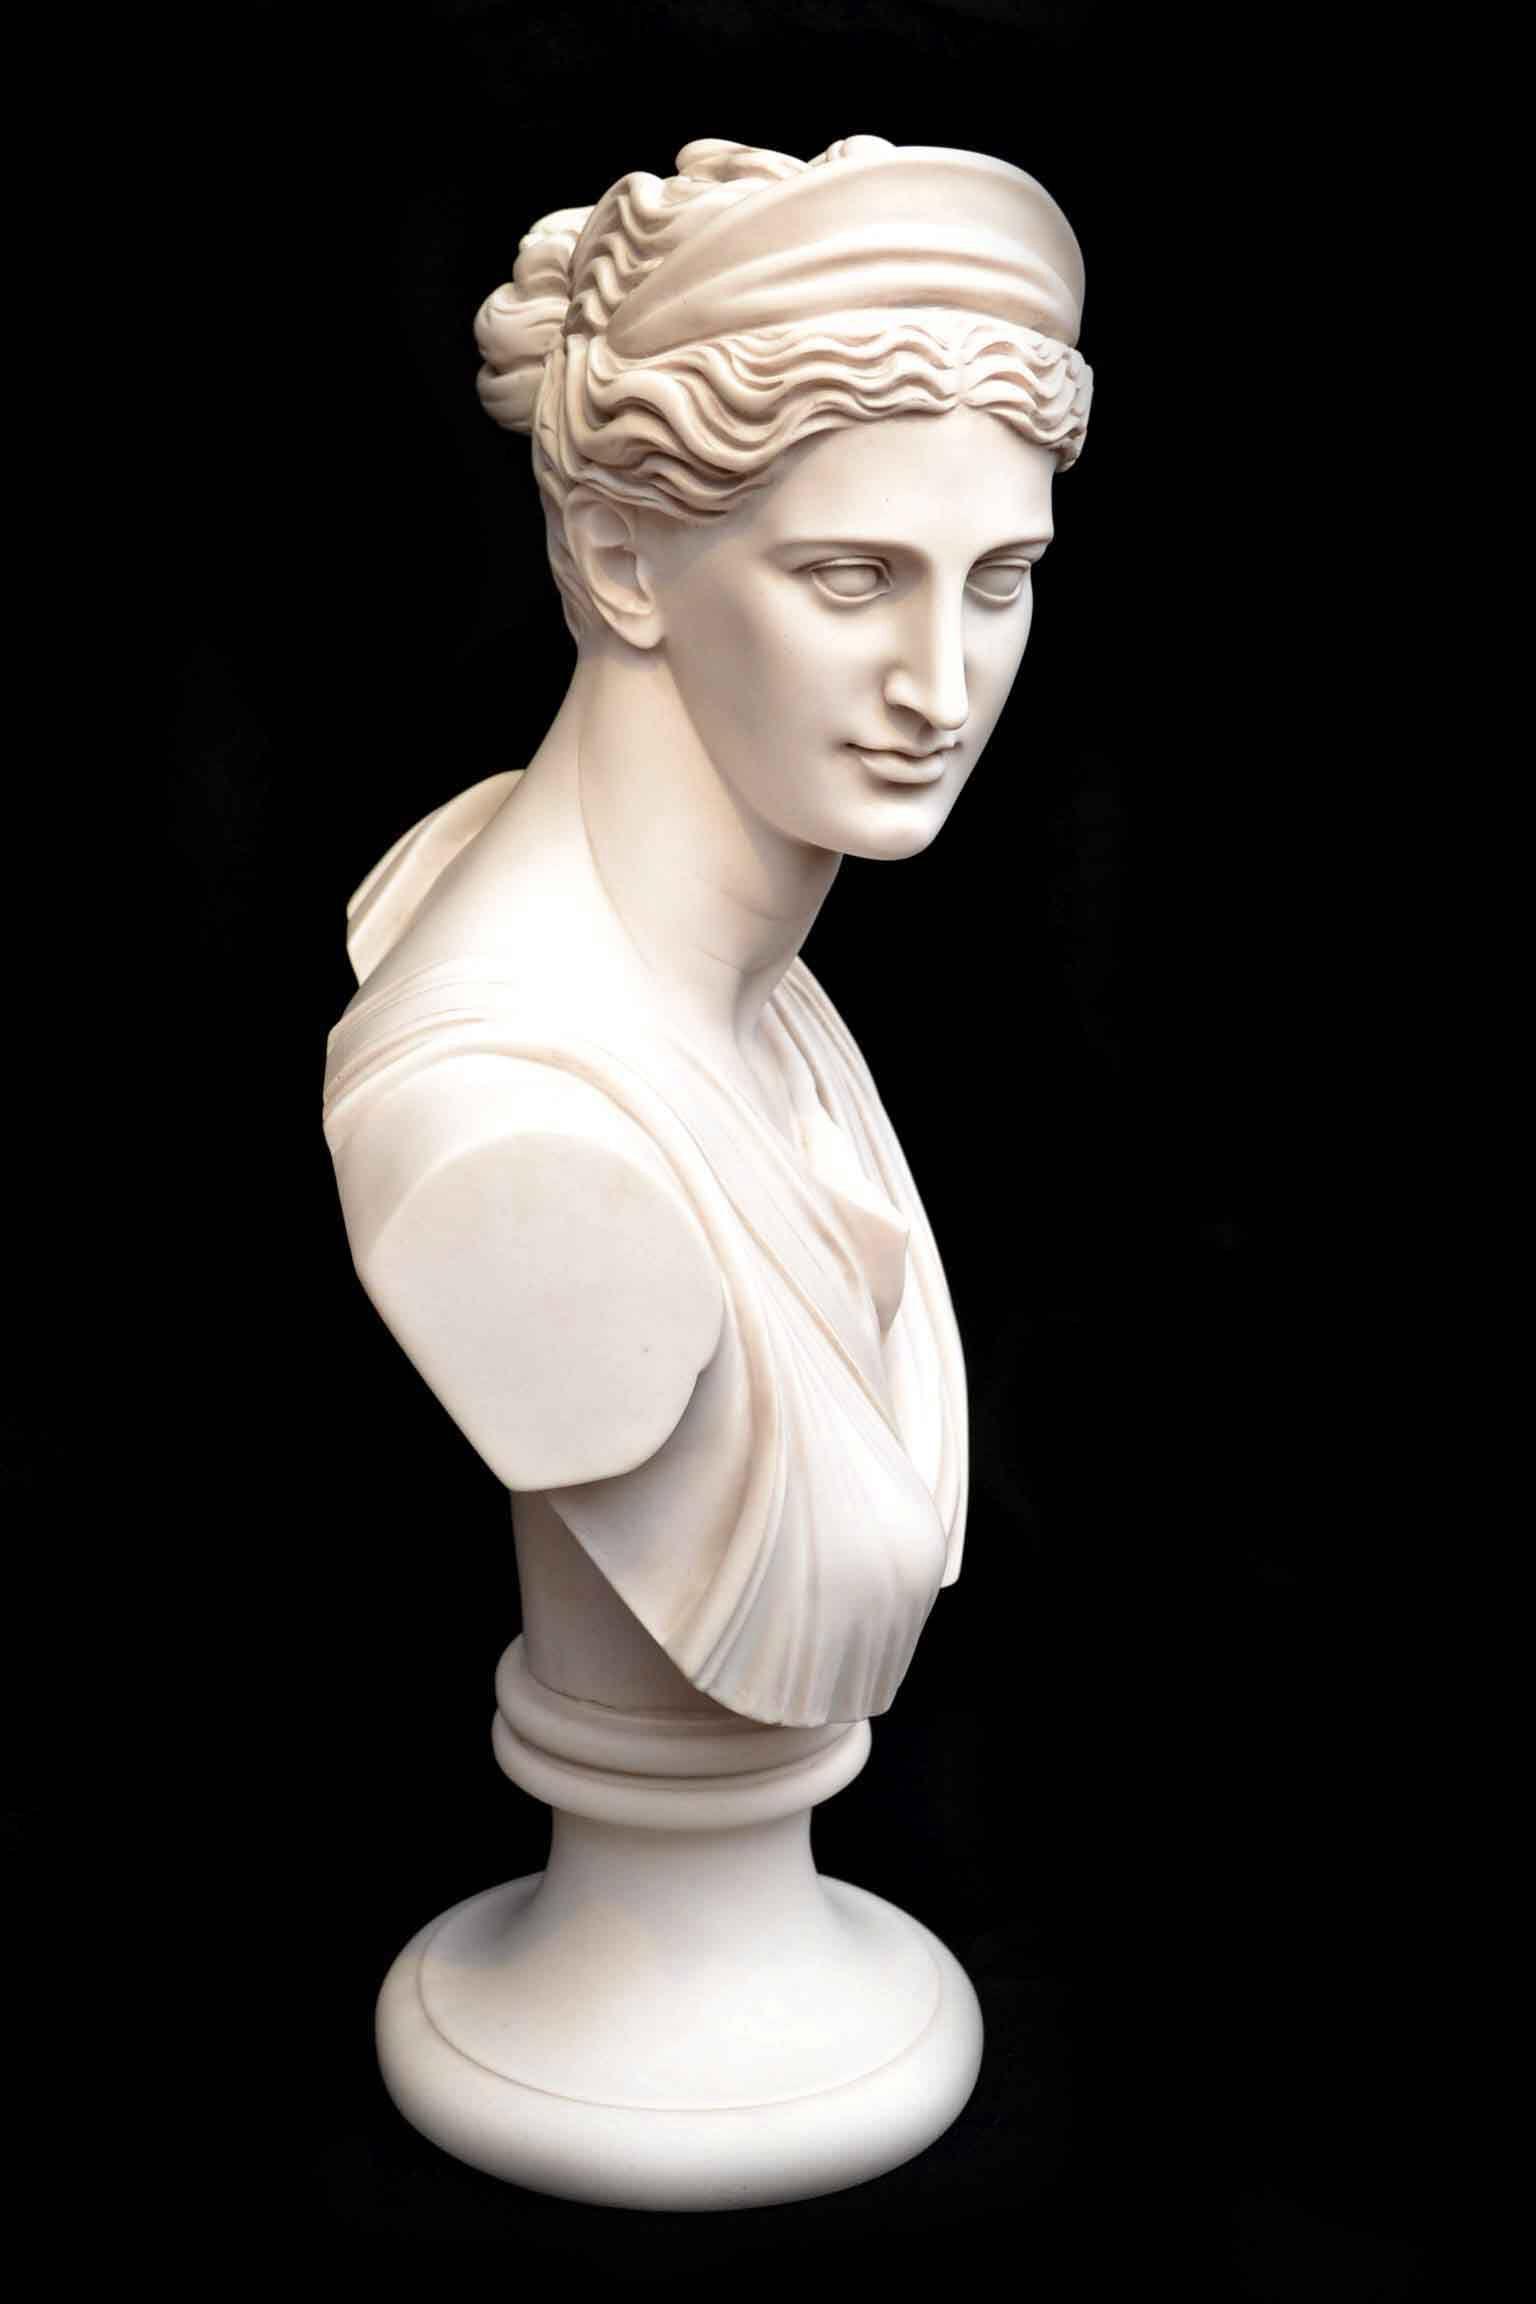 Stunning-Marble-Bust-of-Diana-8.jpg. | Sculpture grecque antique, Sculpture grecque, Sculpture